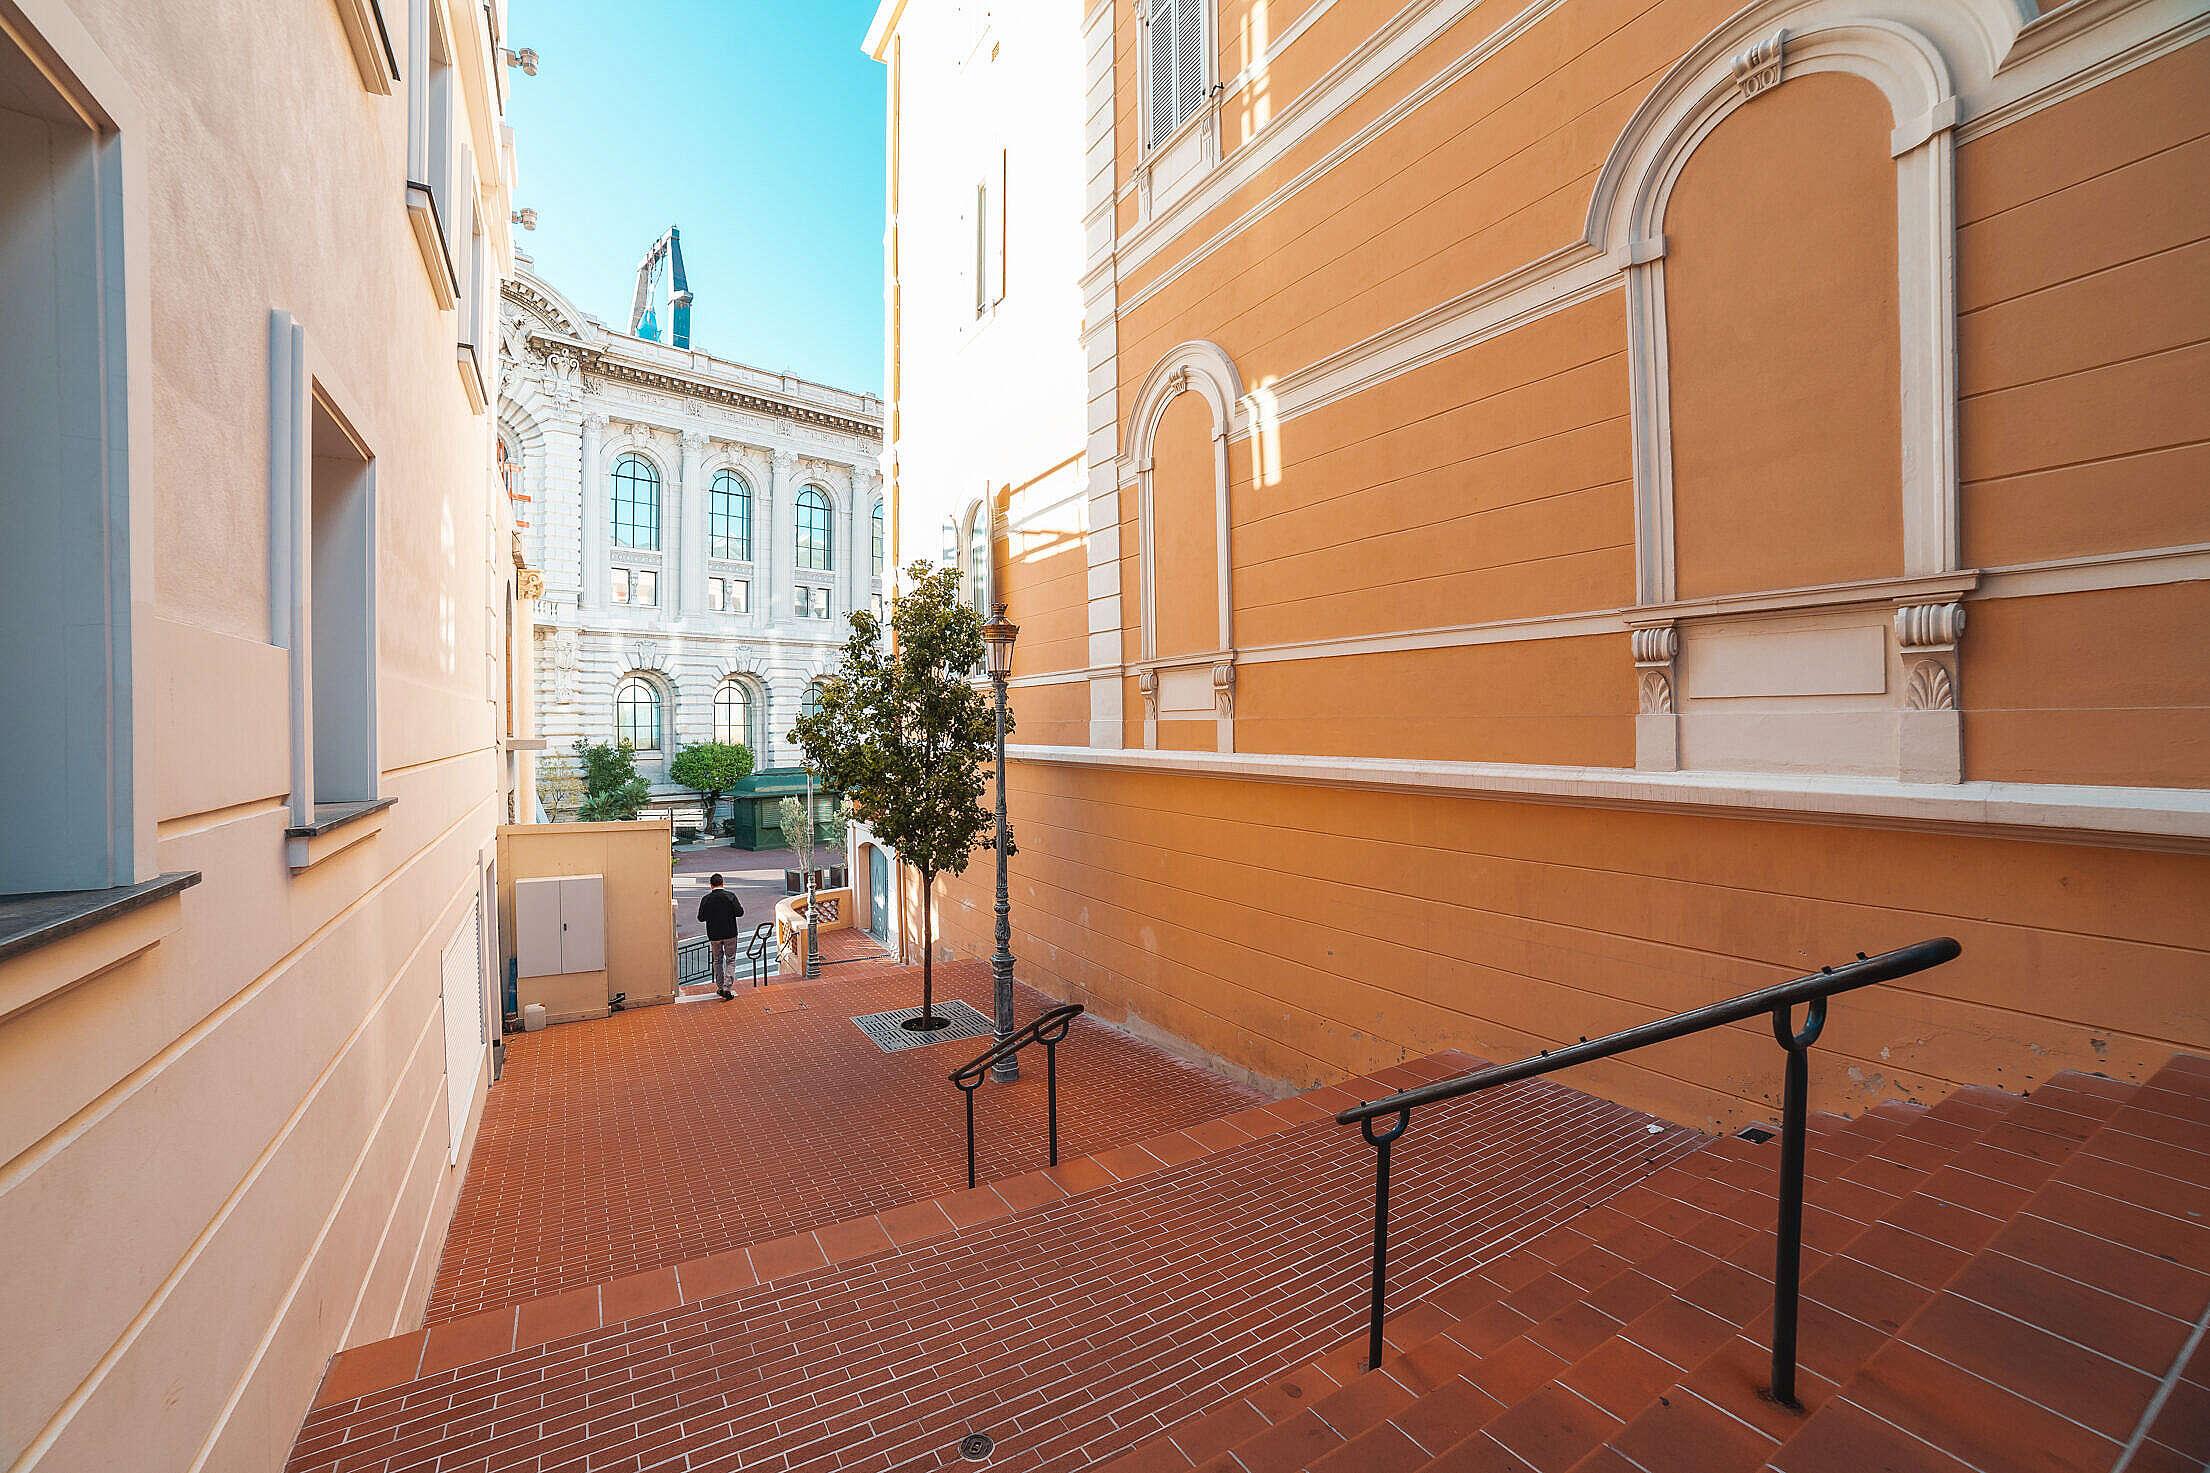 Super Clean Streets of Monaco Free Stock Photo